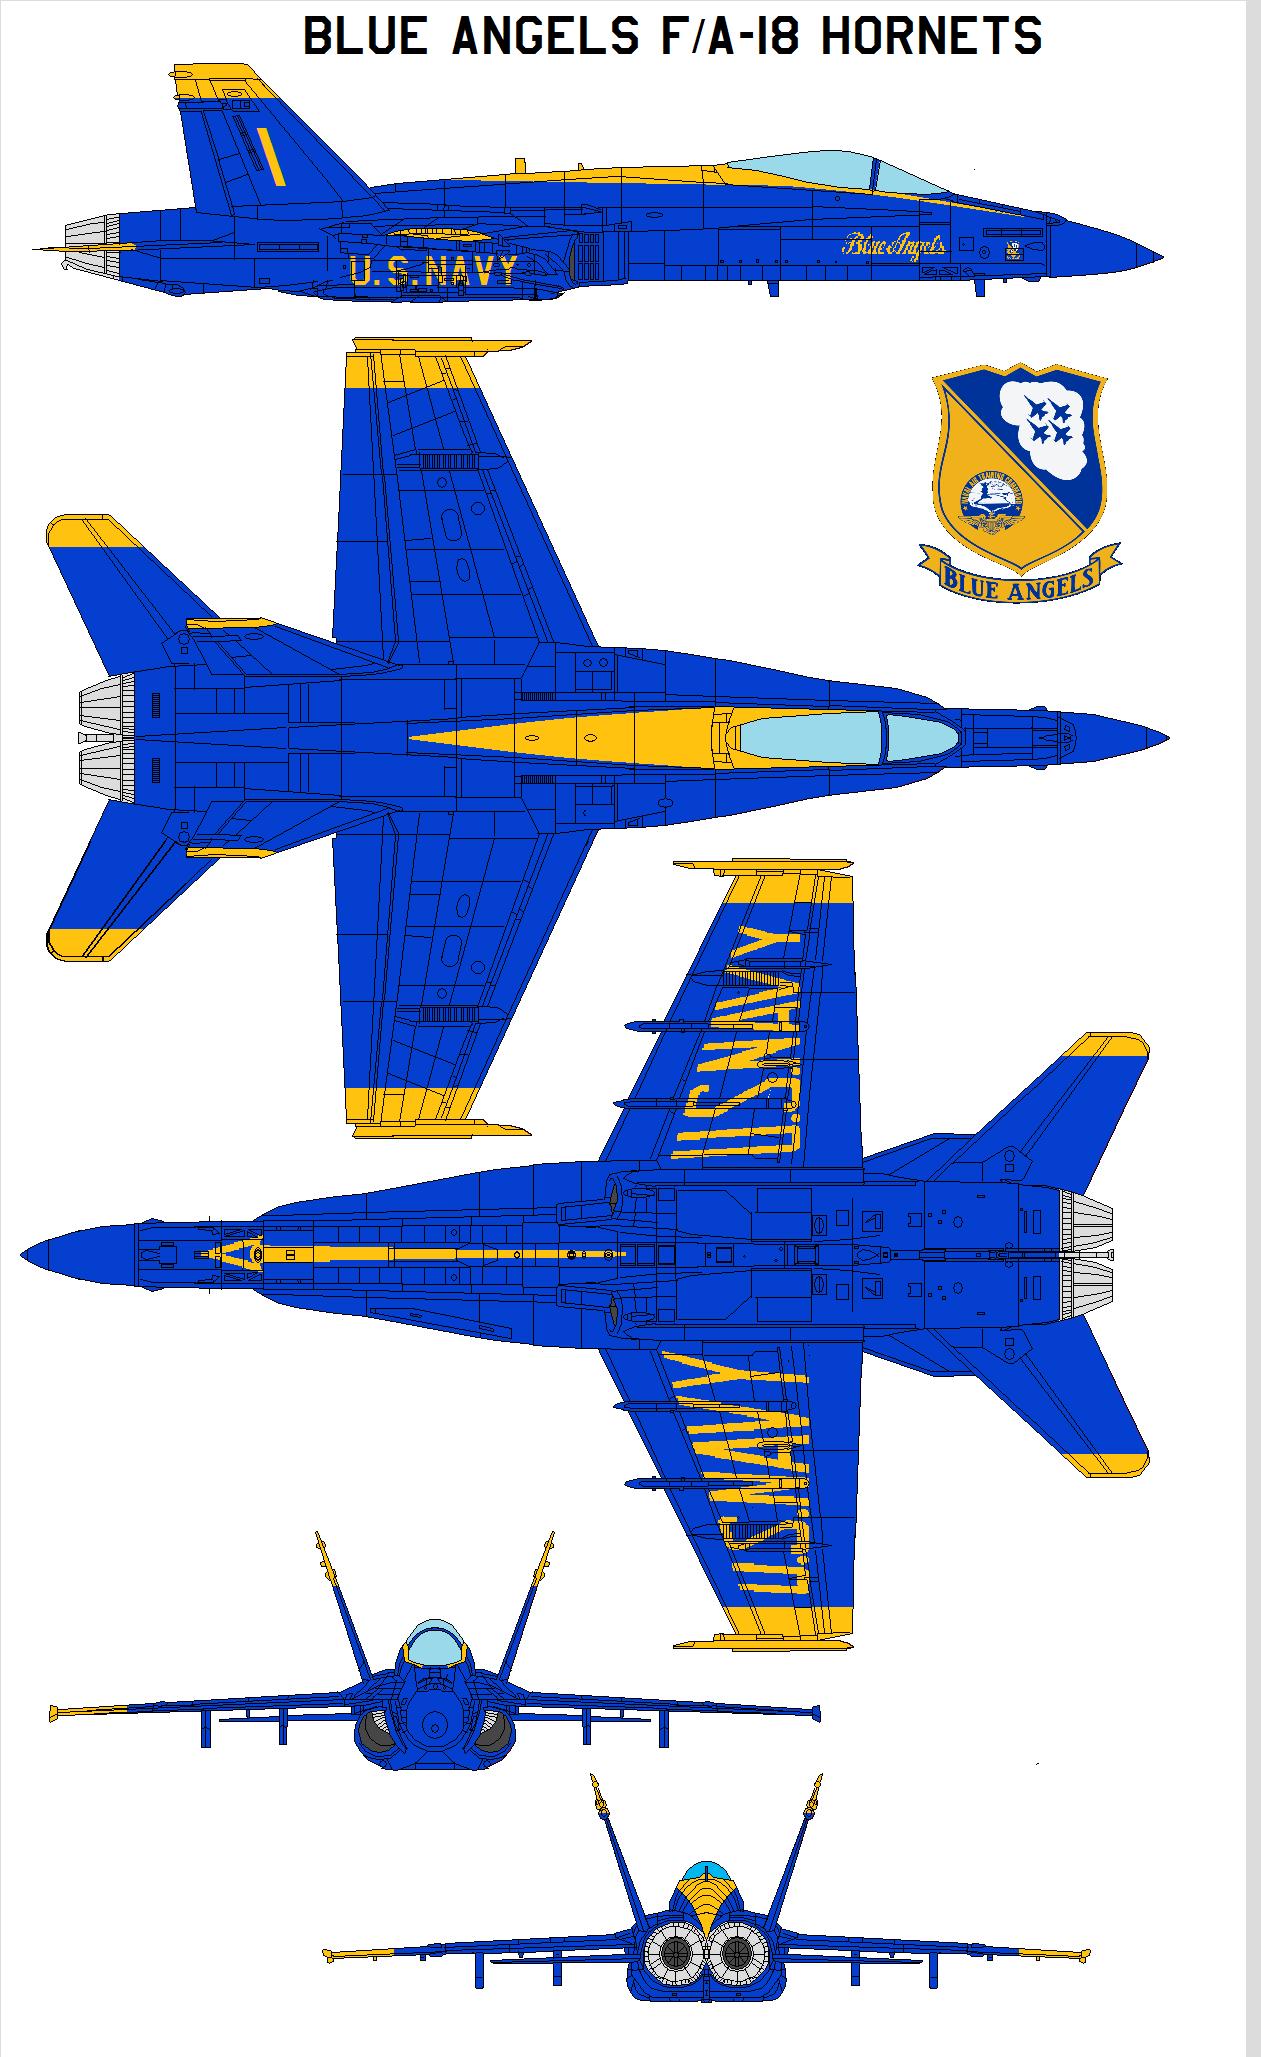 Blue Angels FA-18 Hornets by =bagera3005 on deviantART | Fleet Week